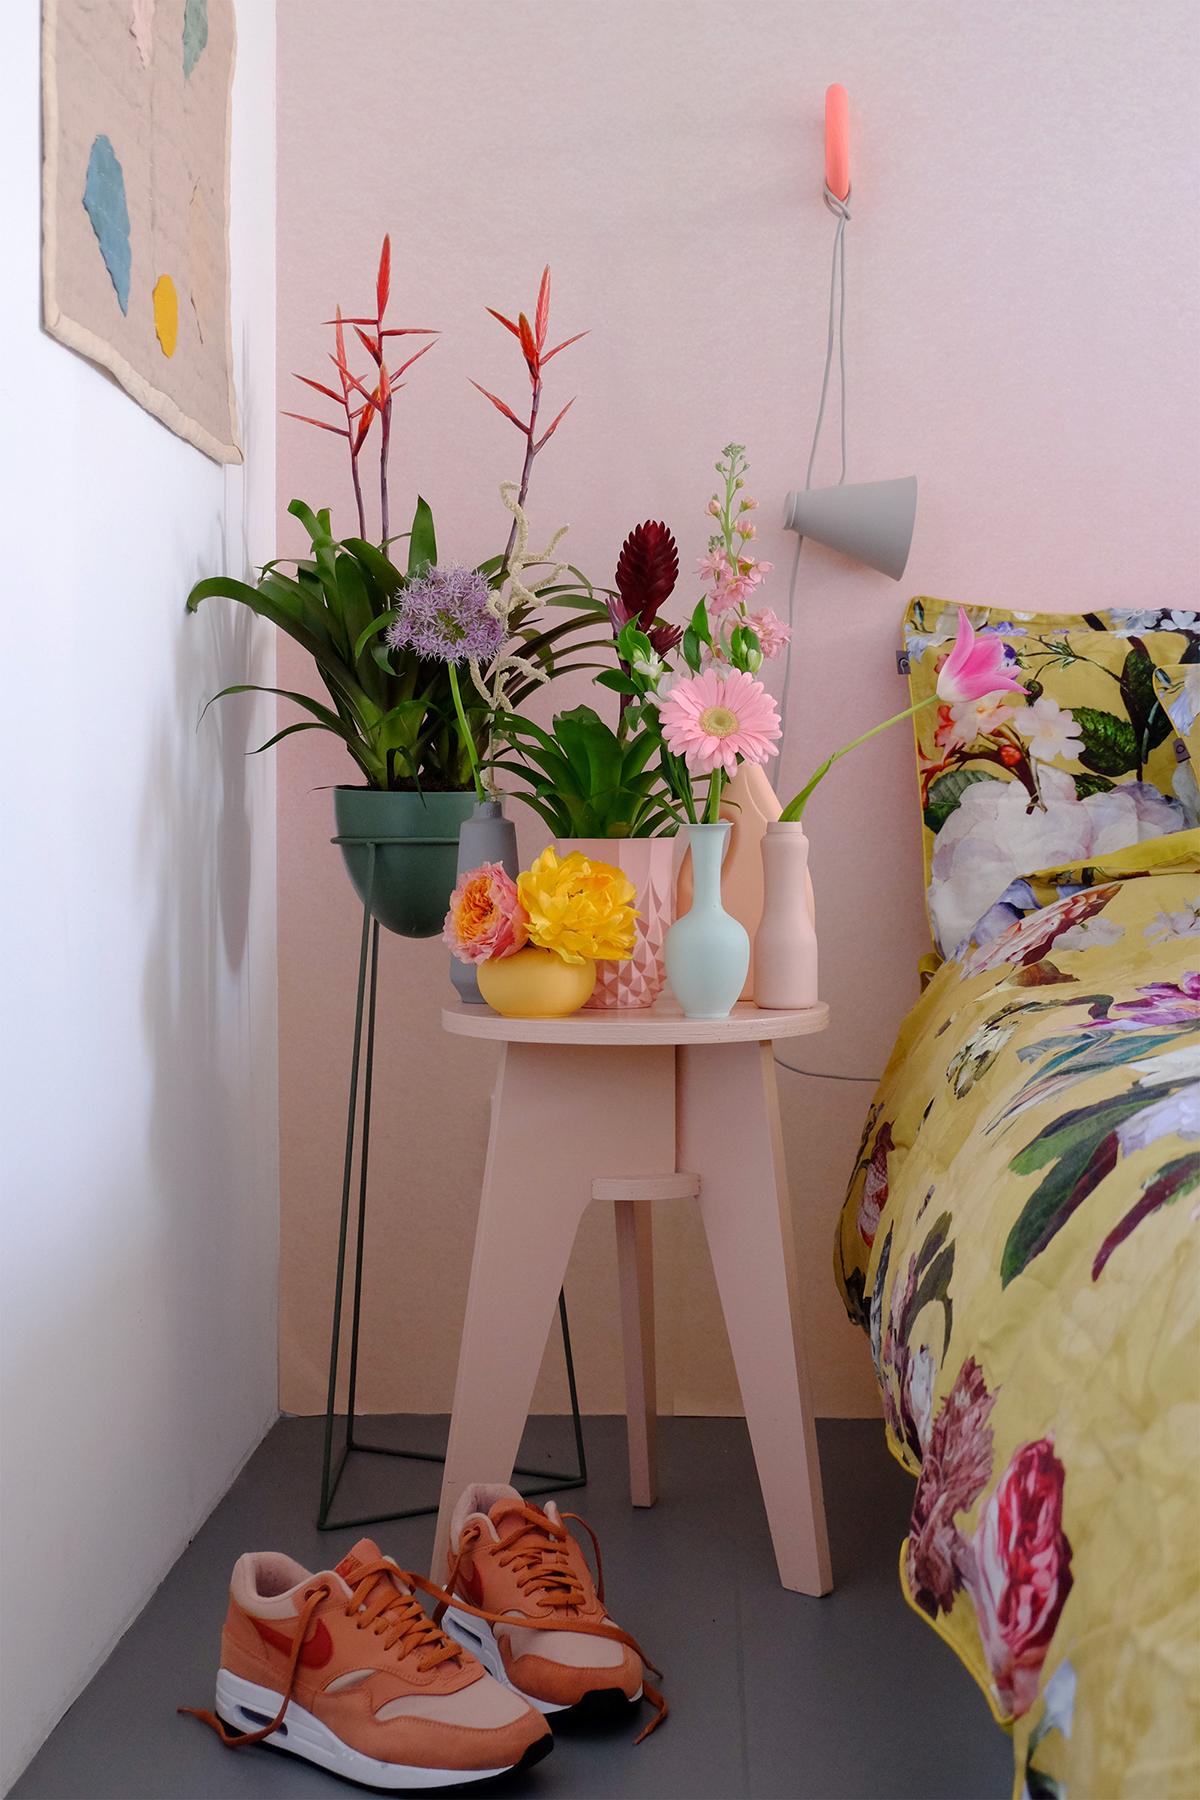 bromelia nachtkastje slaapkamer